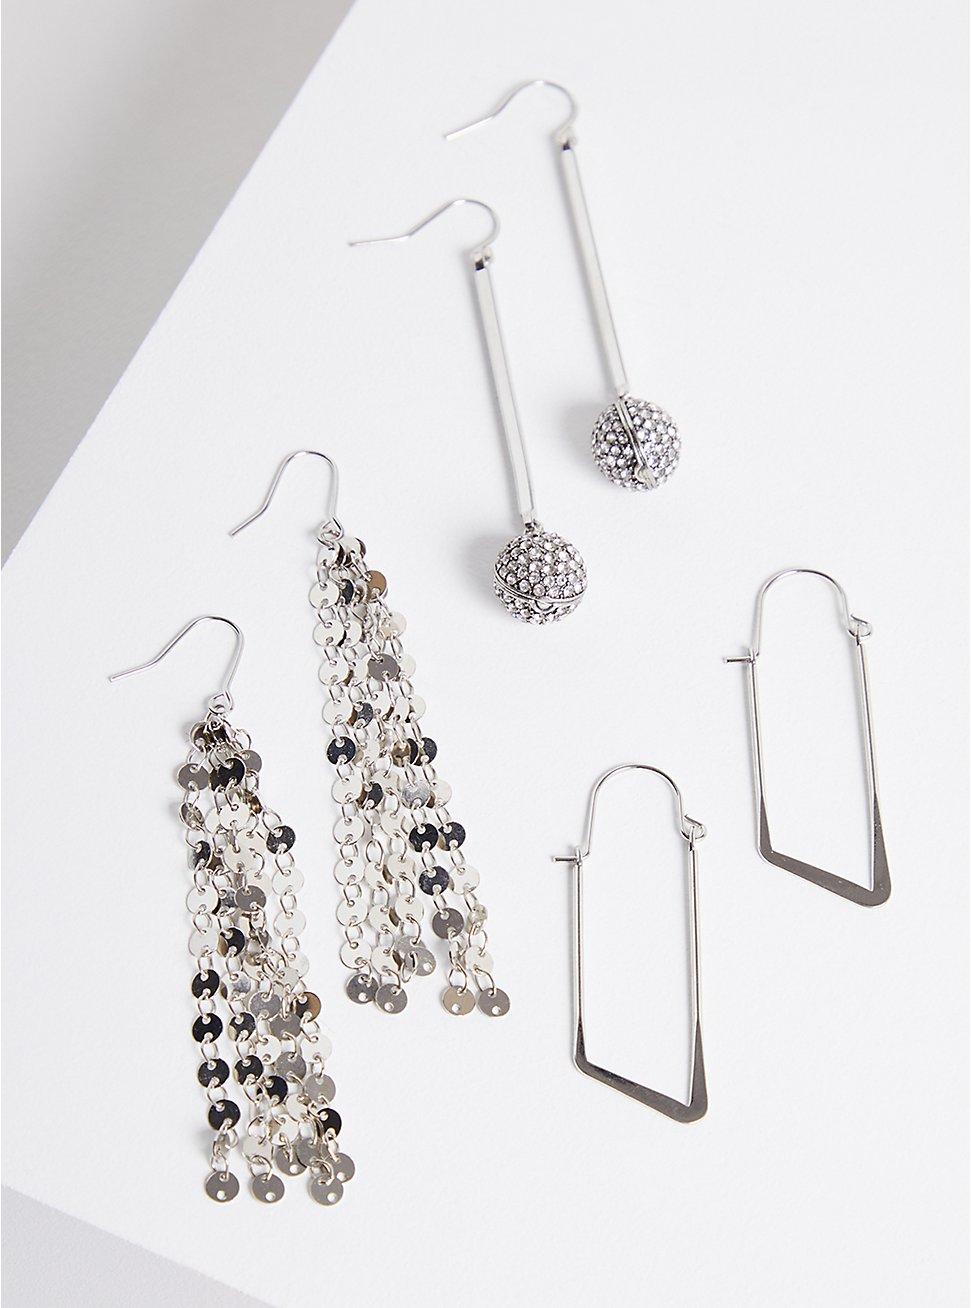 Linear & Drop Earring Set of 3 - Silver Tone, , hi-res